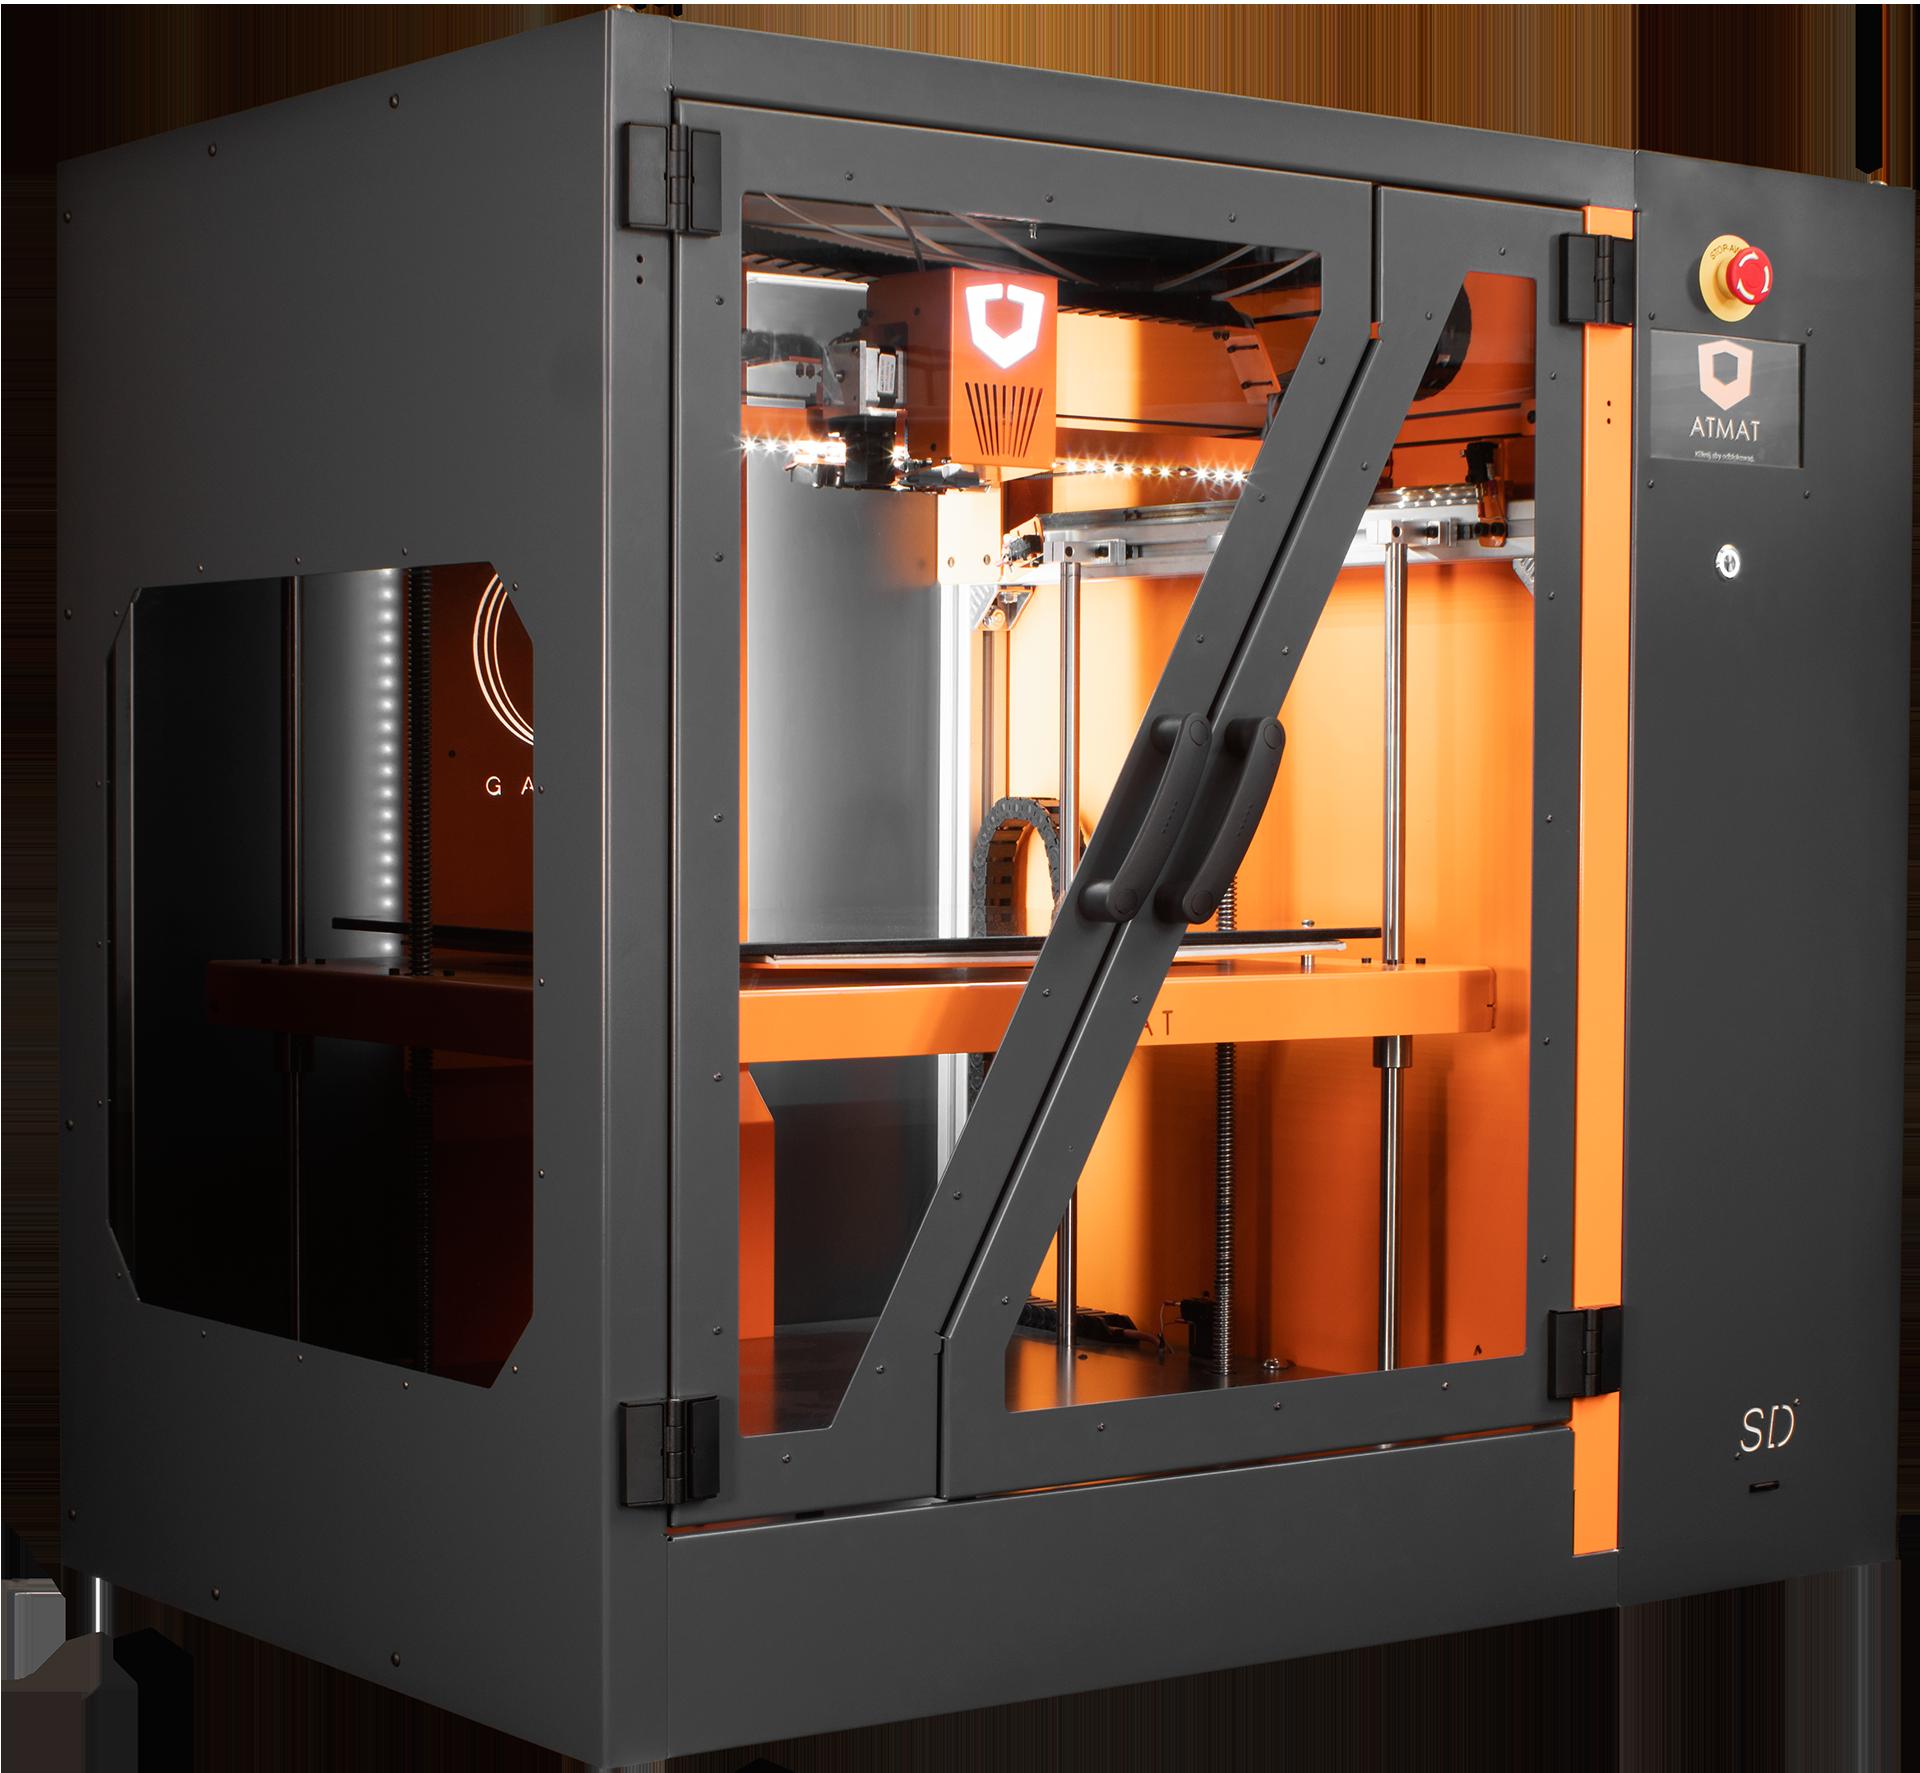 Galaxy 3D printer